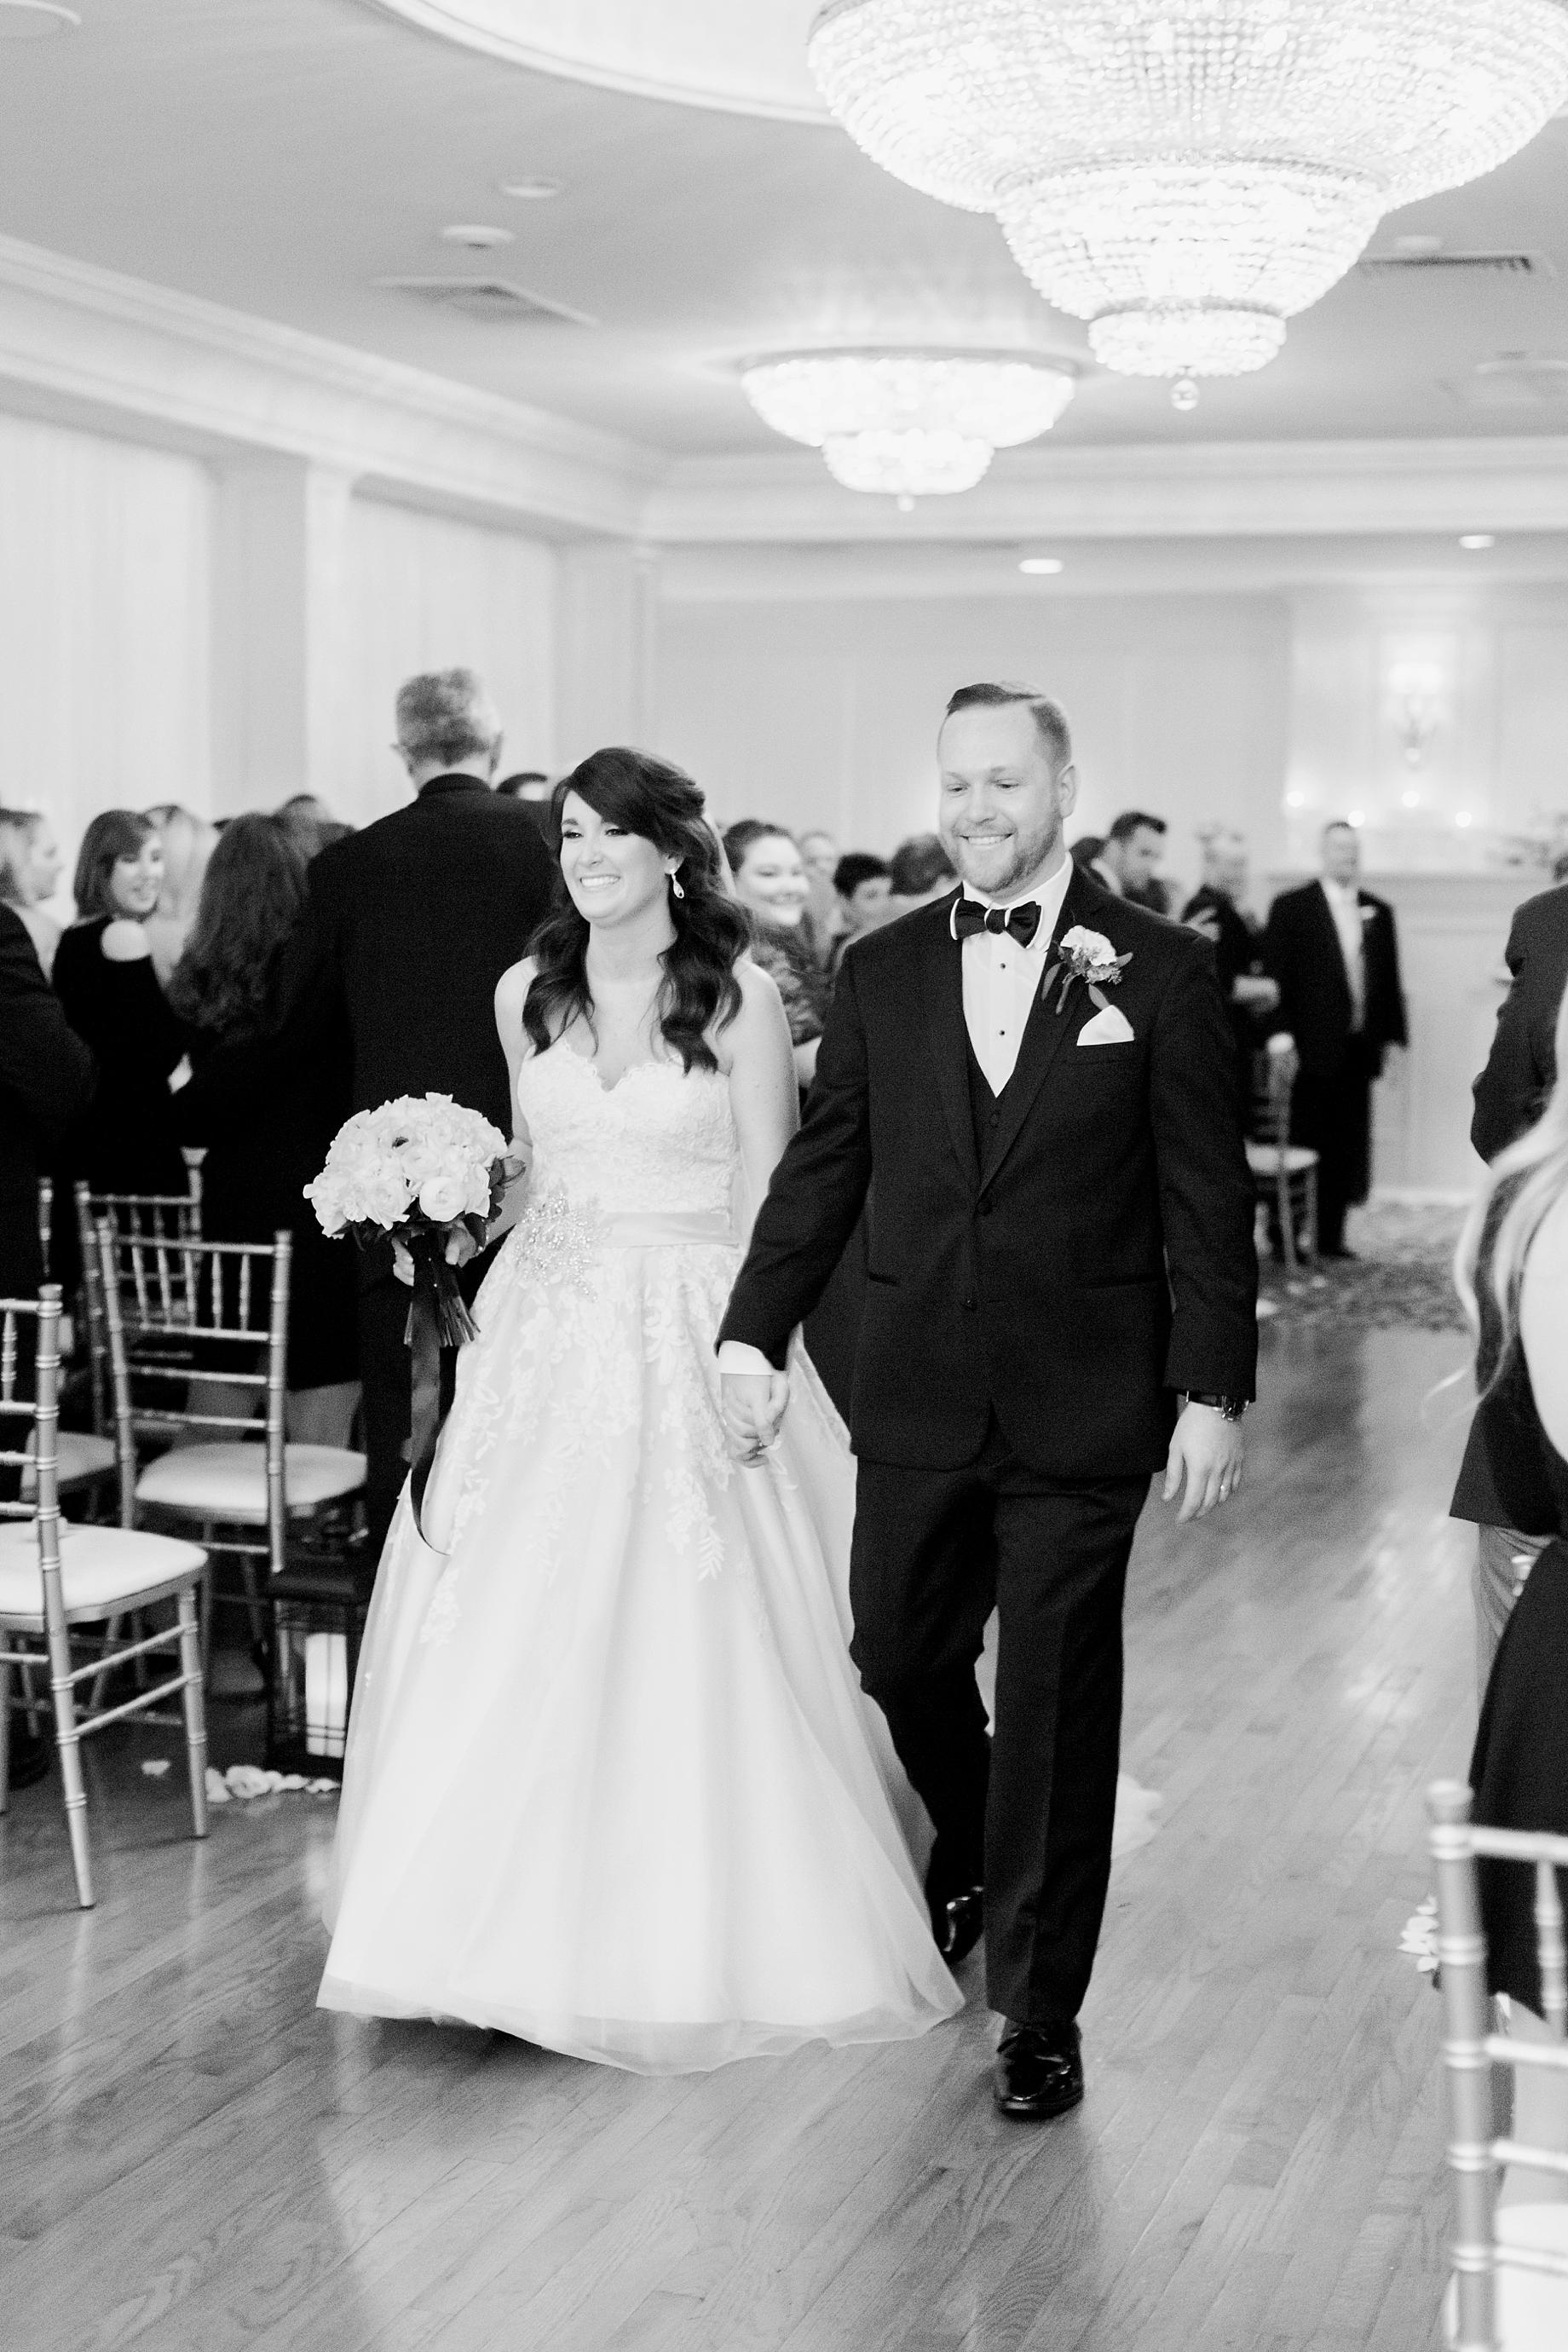 William Penn Inn Wedding Ceremony